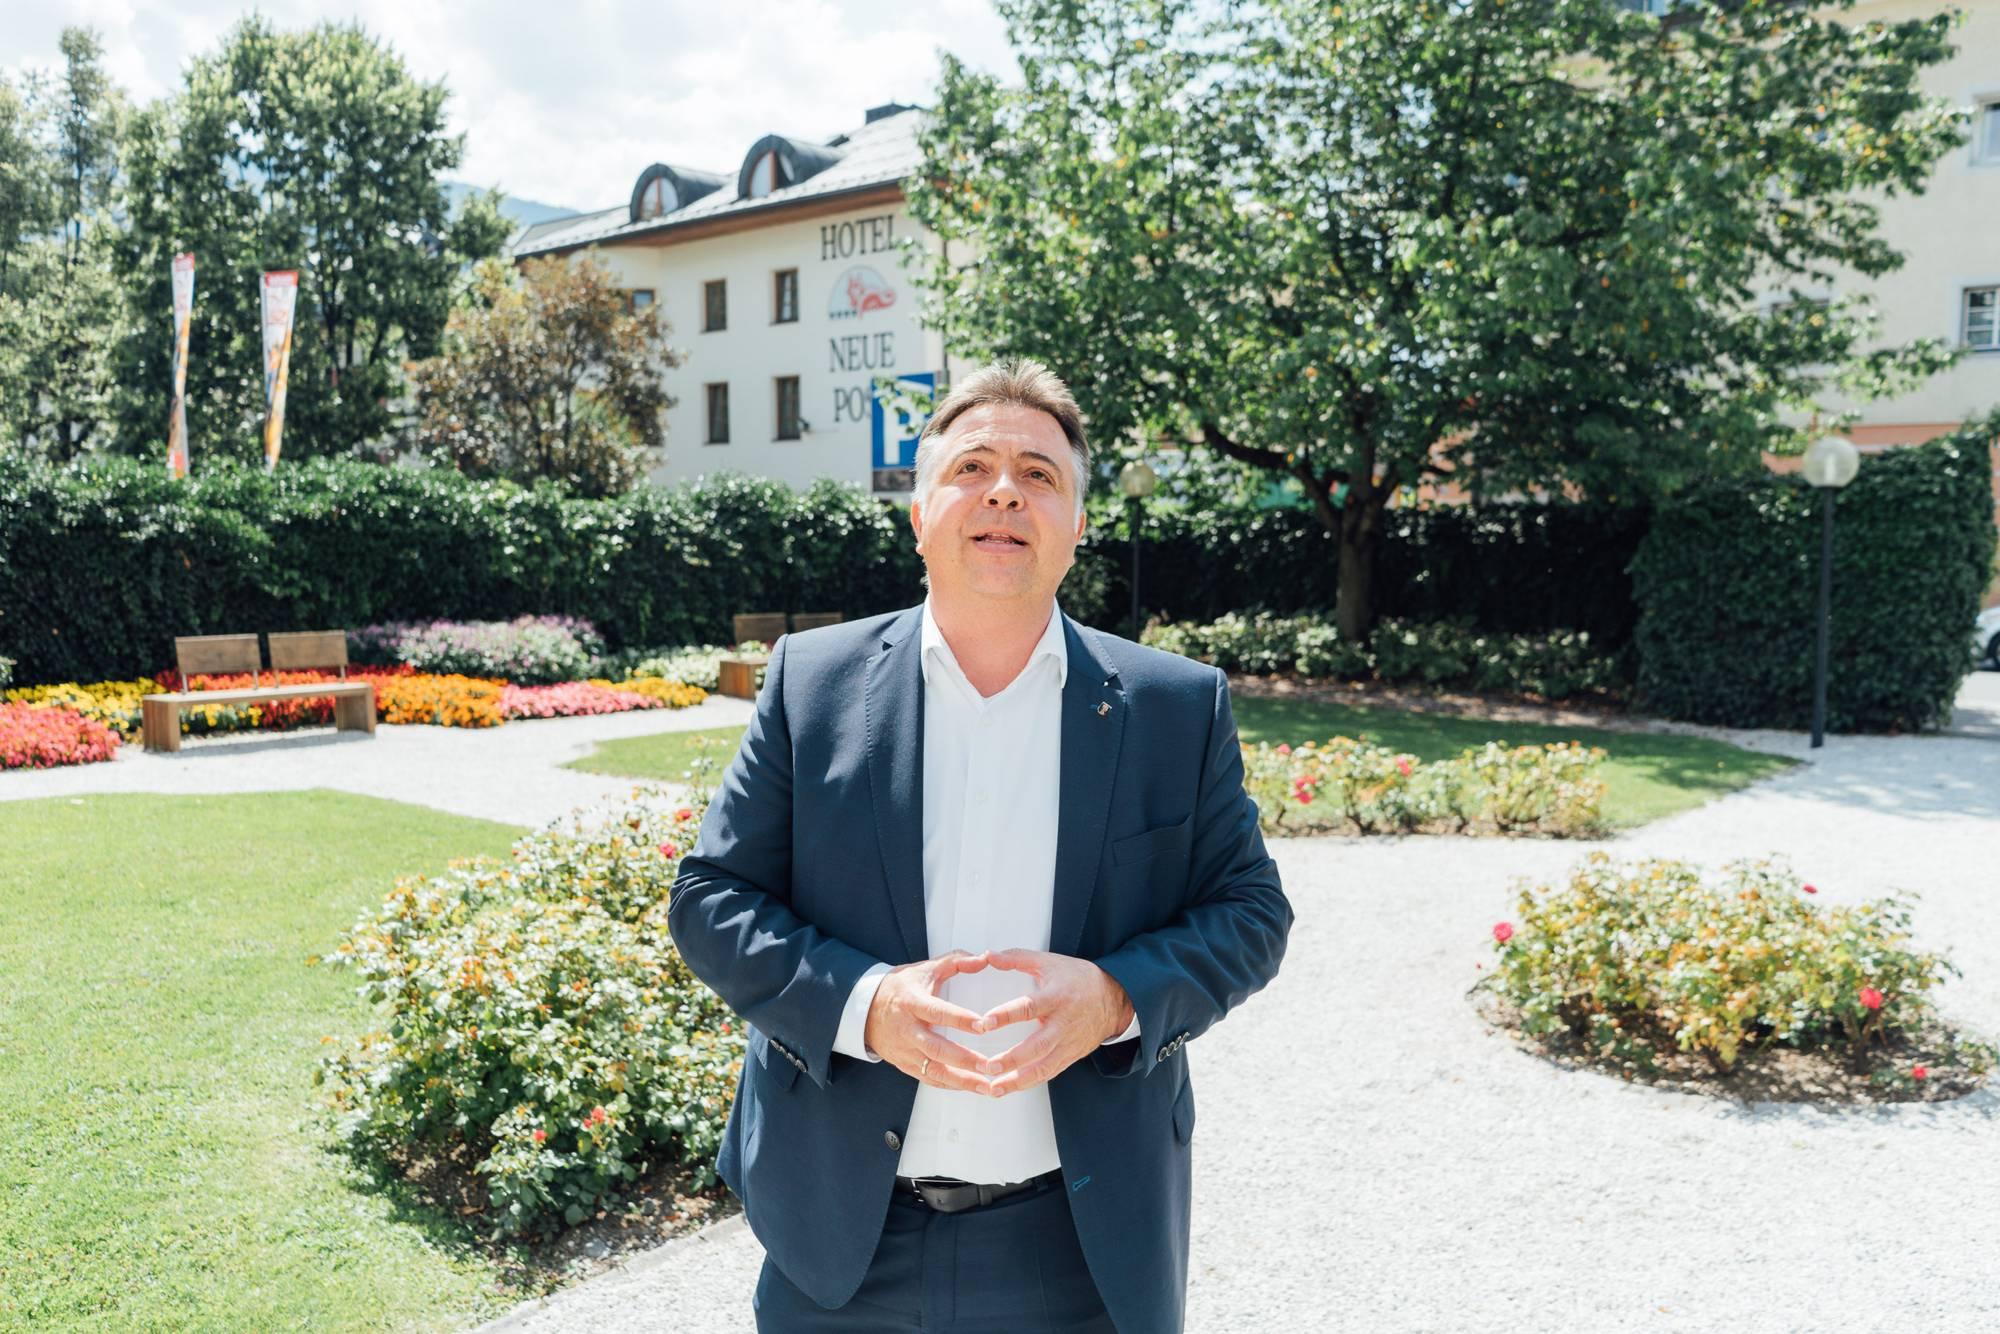 Former Mayor Padourek in the rose garden